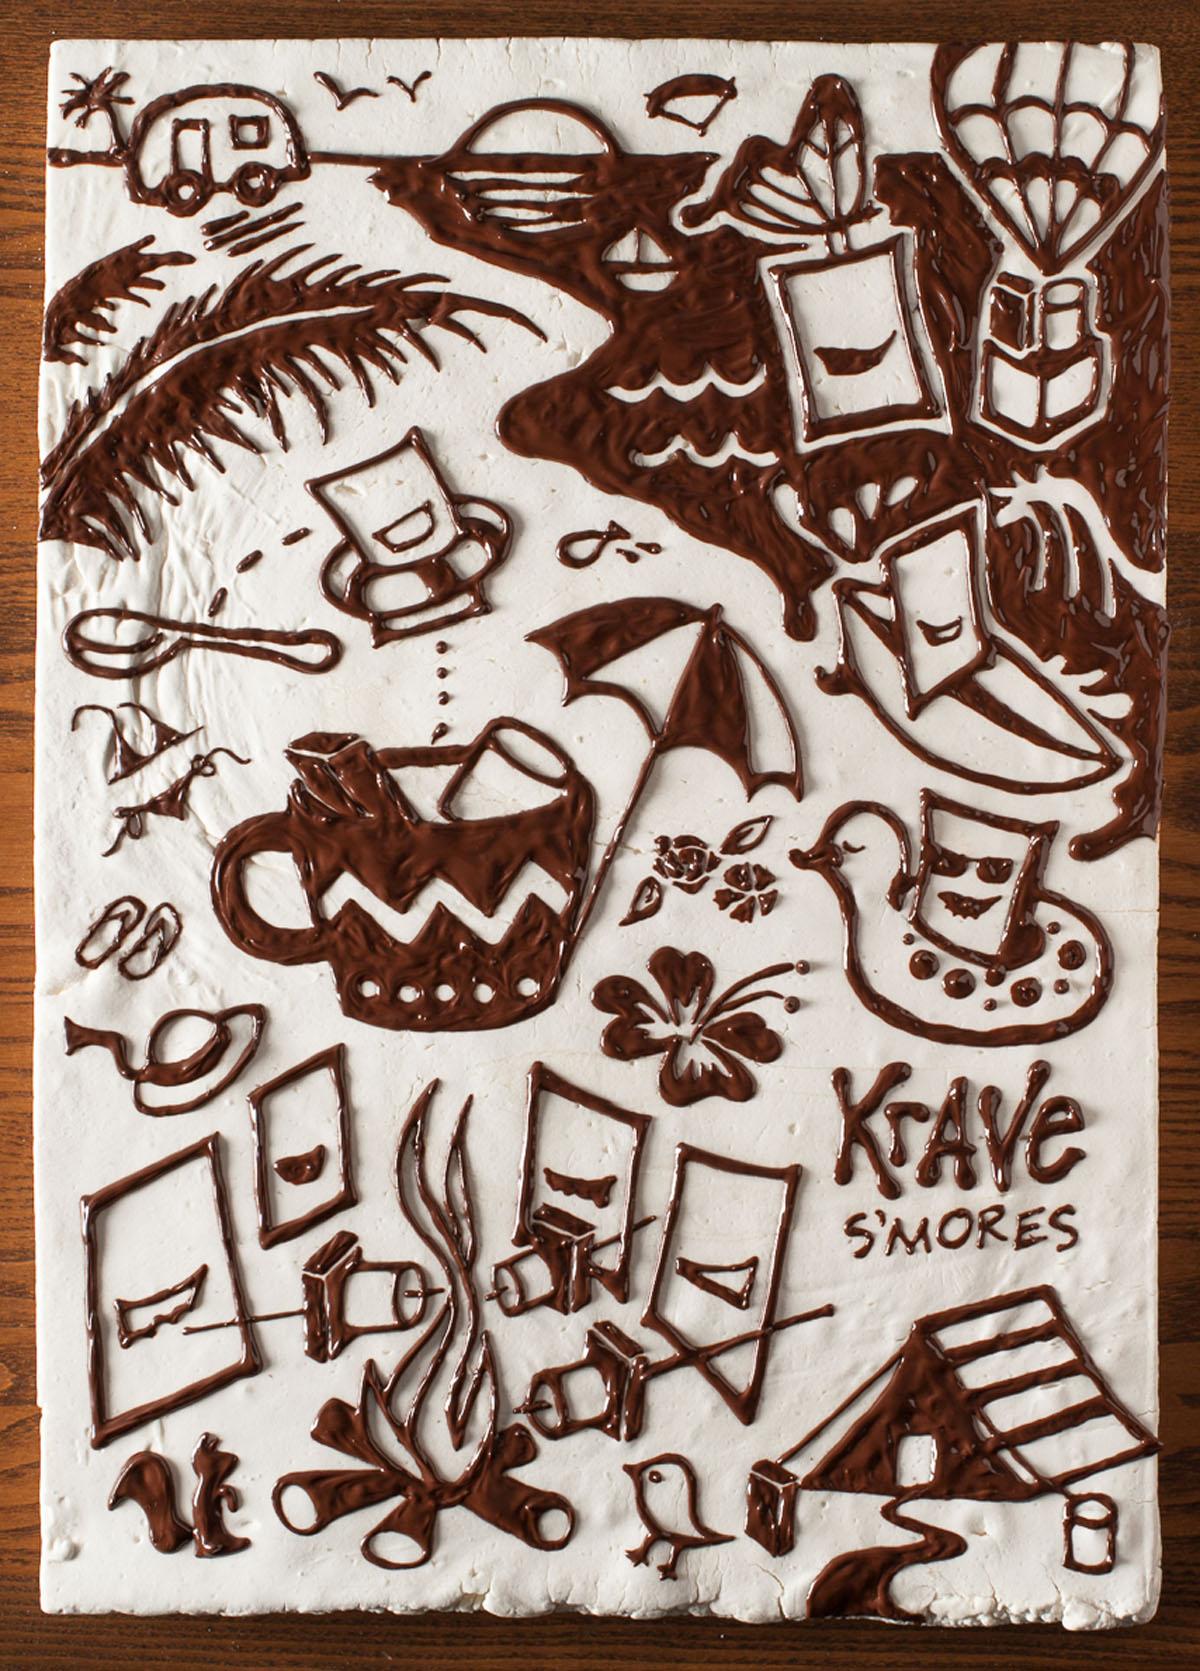 RENEE MELO LTD SMORIFY KRAVE KELLOGGS CHOCOLATE MARSHMALLOW FACEBOOK_08